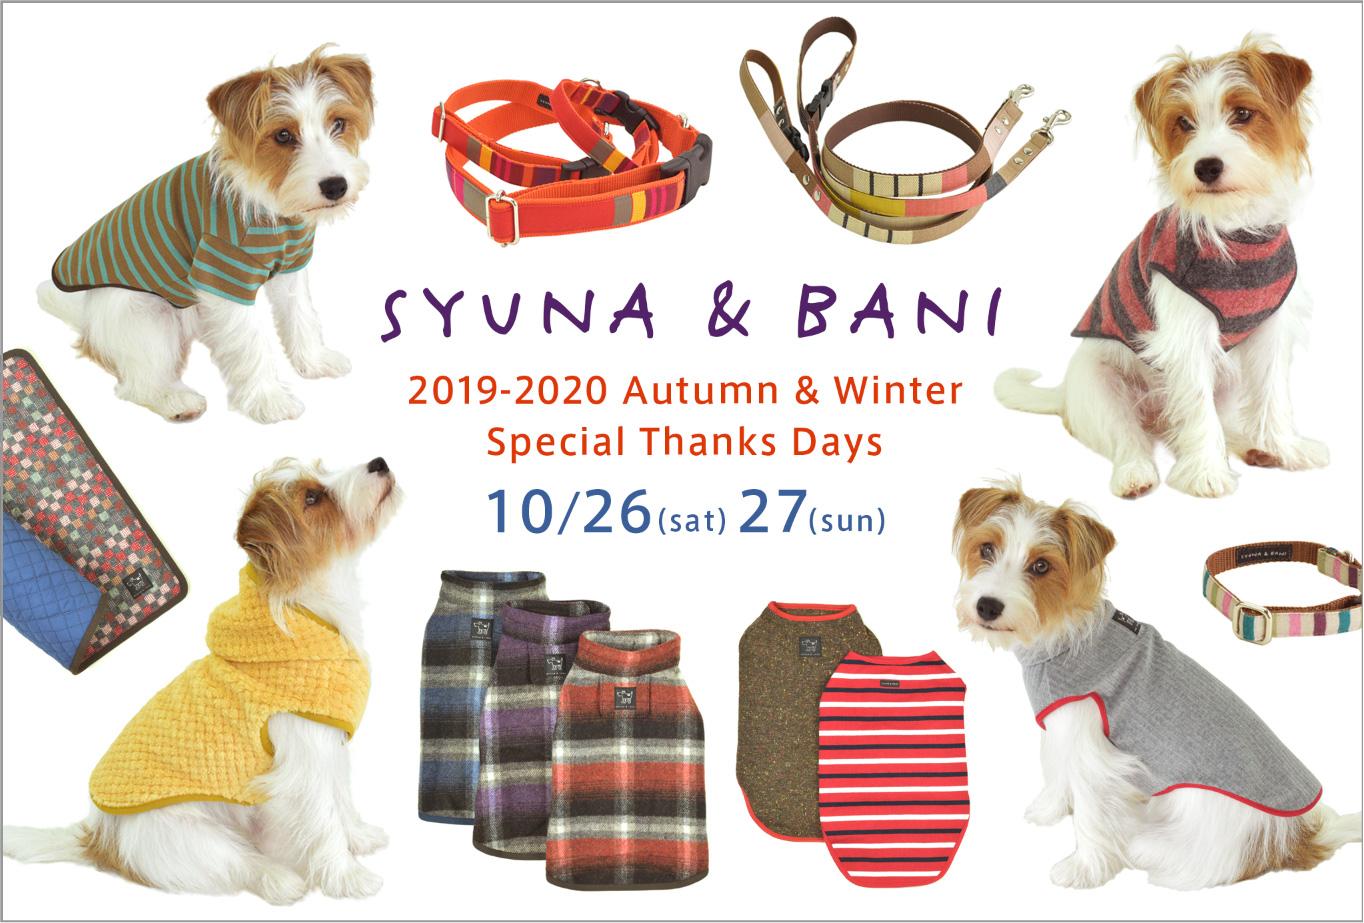 http://syuna-bani.net/blog/191017_19-20aw_fair_dm.jpg